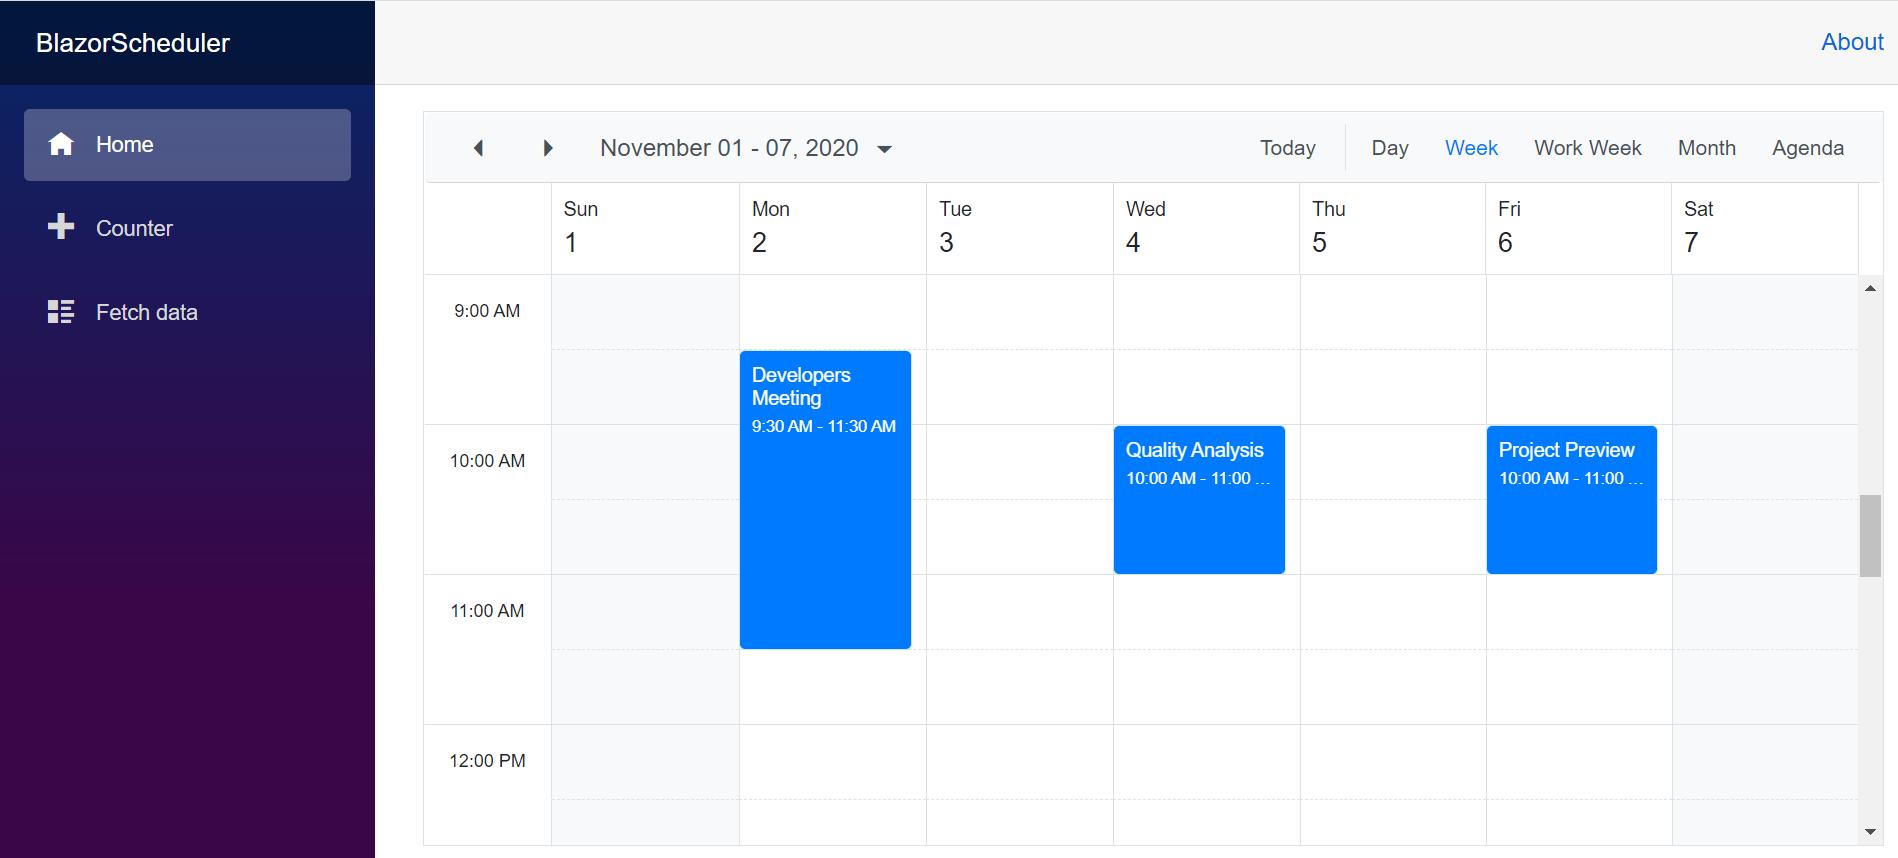 Google Calendar Synchronized with Syncfusion Blazor Scheduler